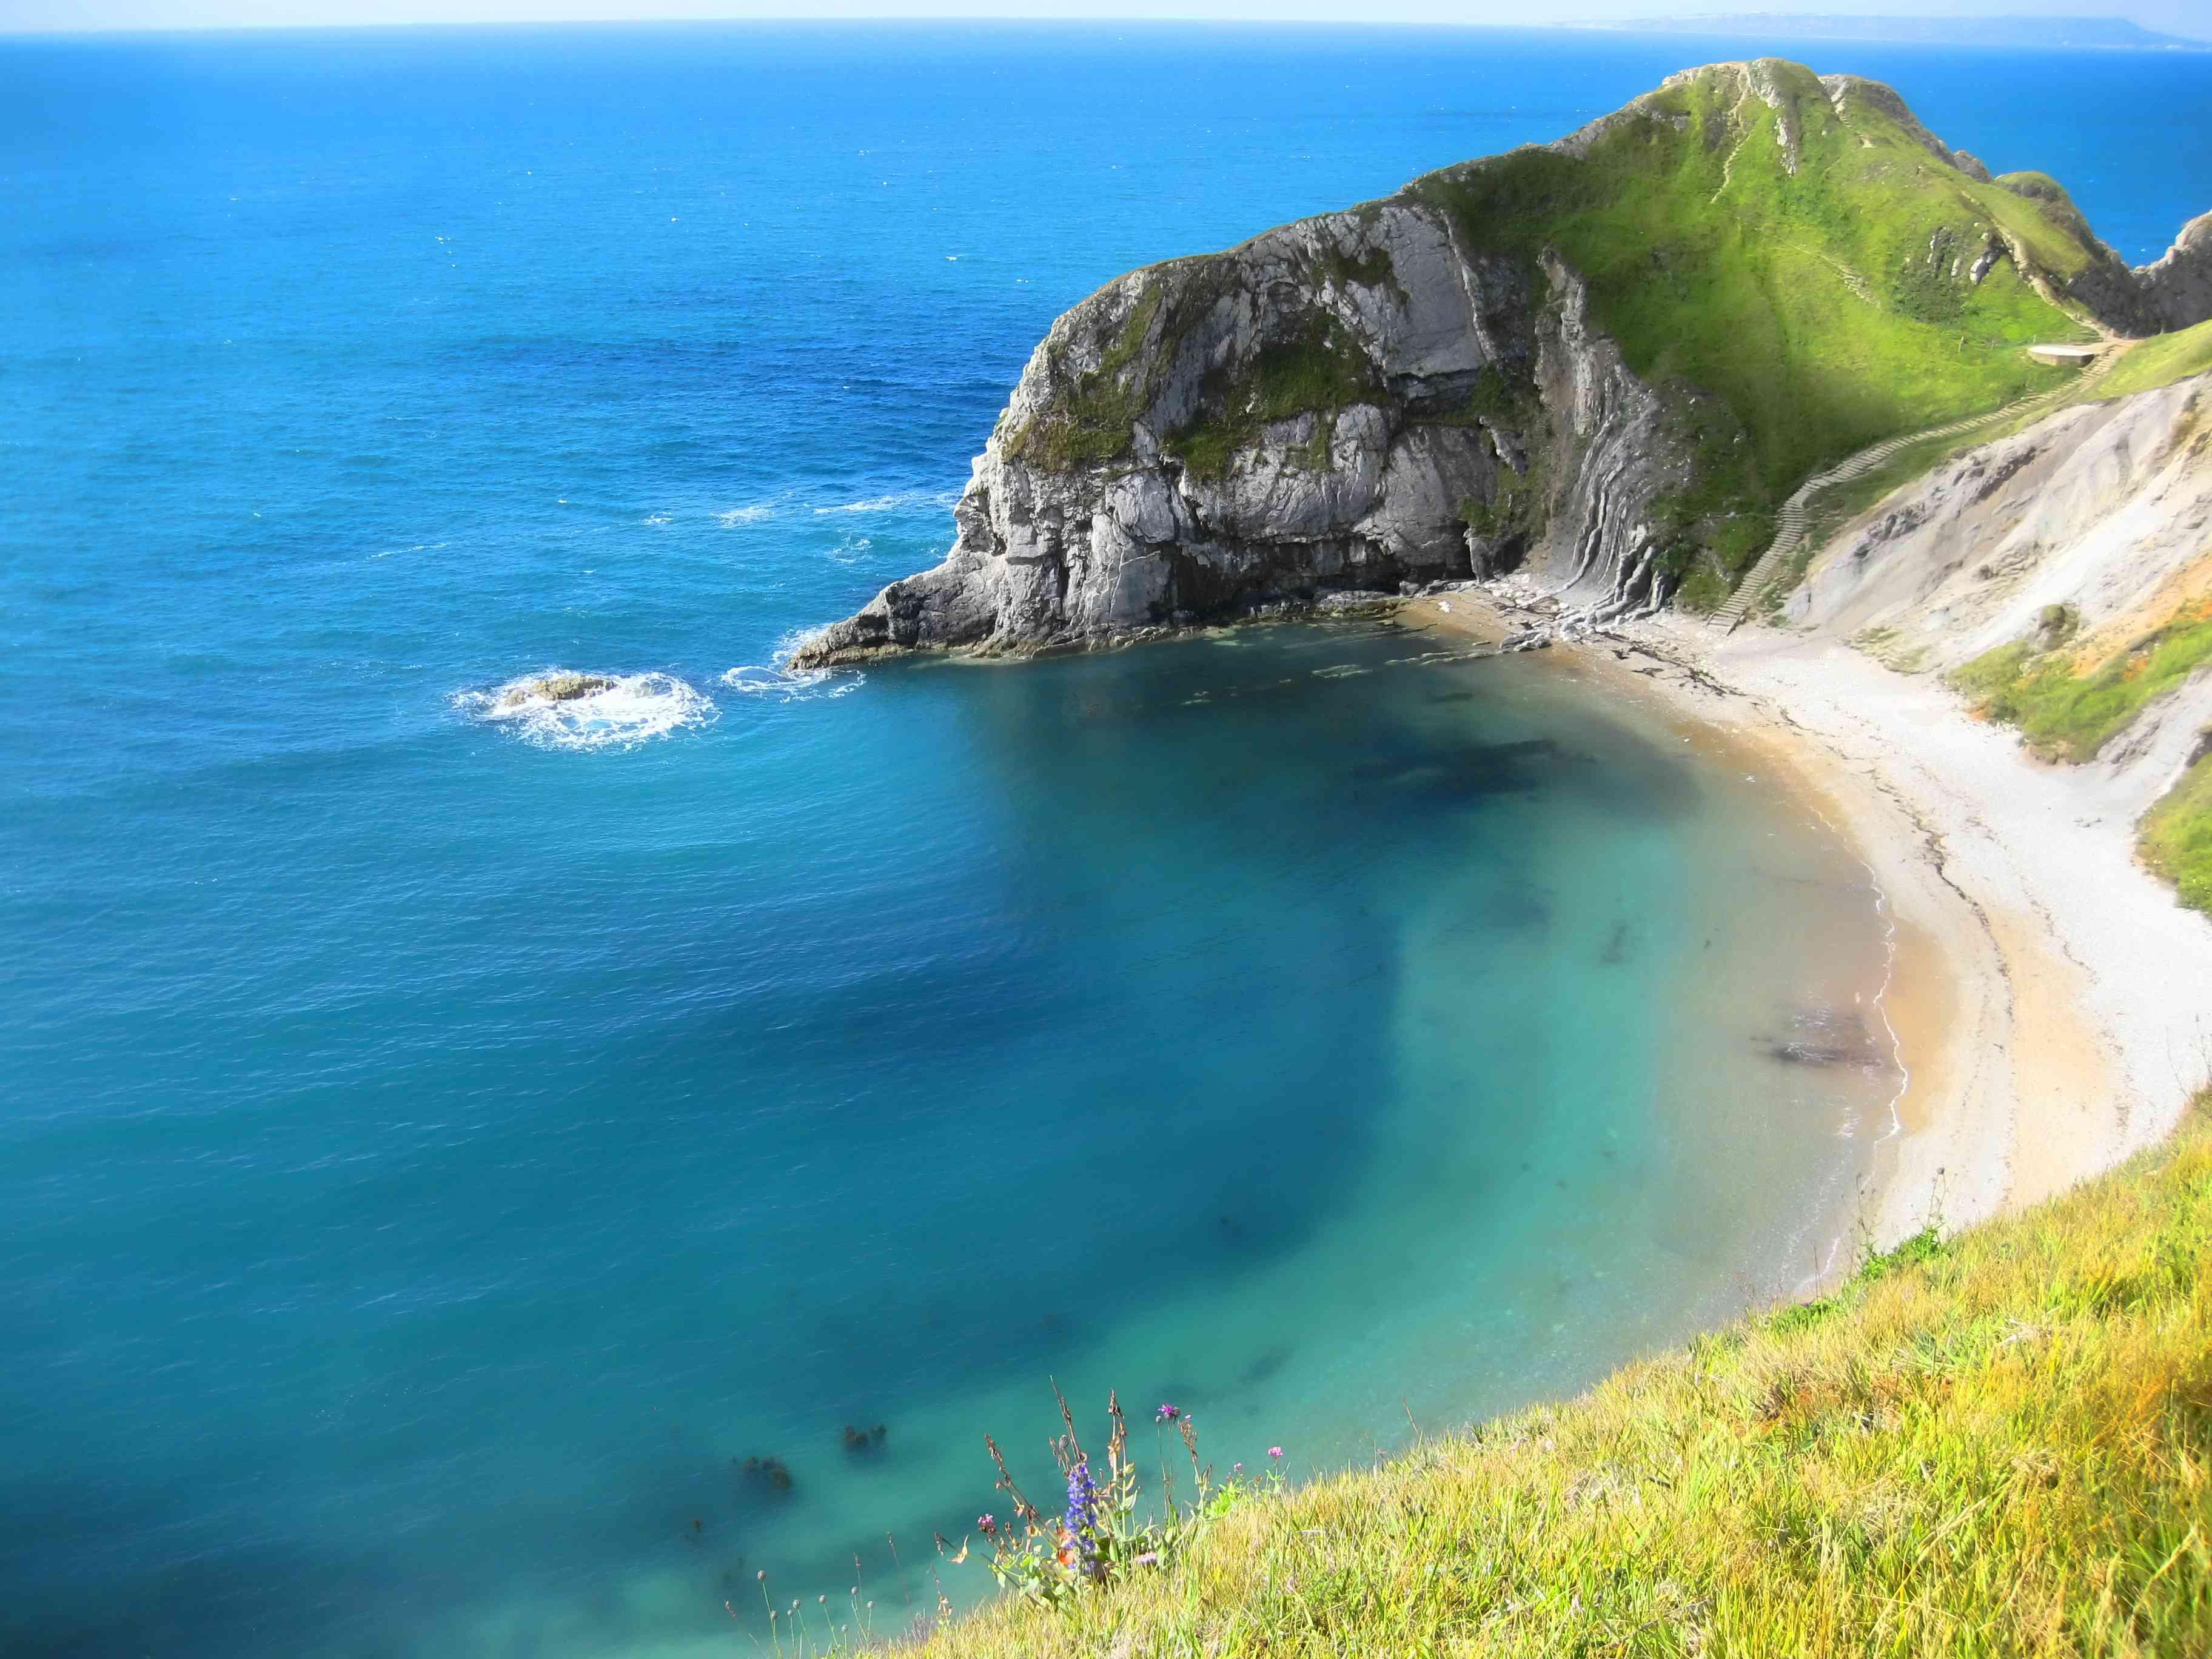 Man of War Bay, Lulworth Cove, Dorset